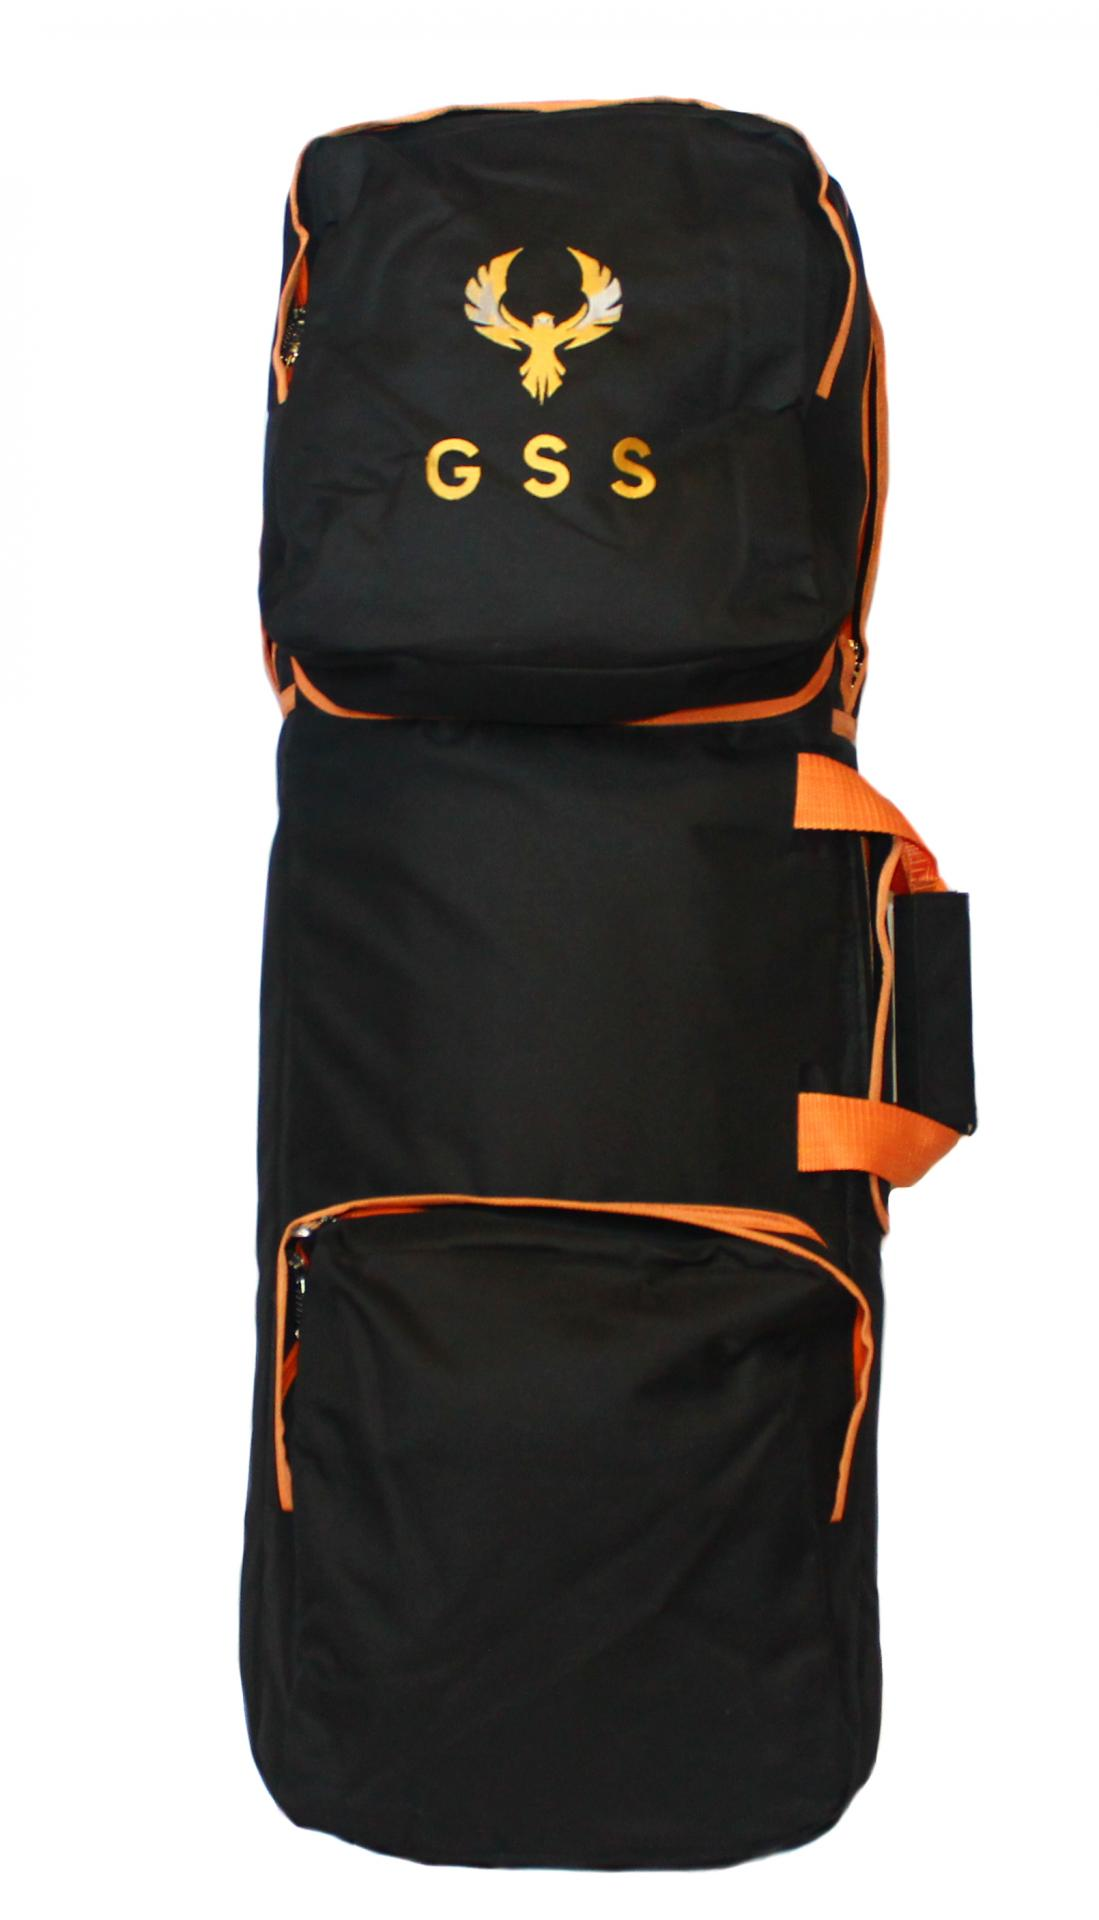 Bolsa de Transporte para Escopeta Naranja y Negro